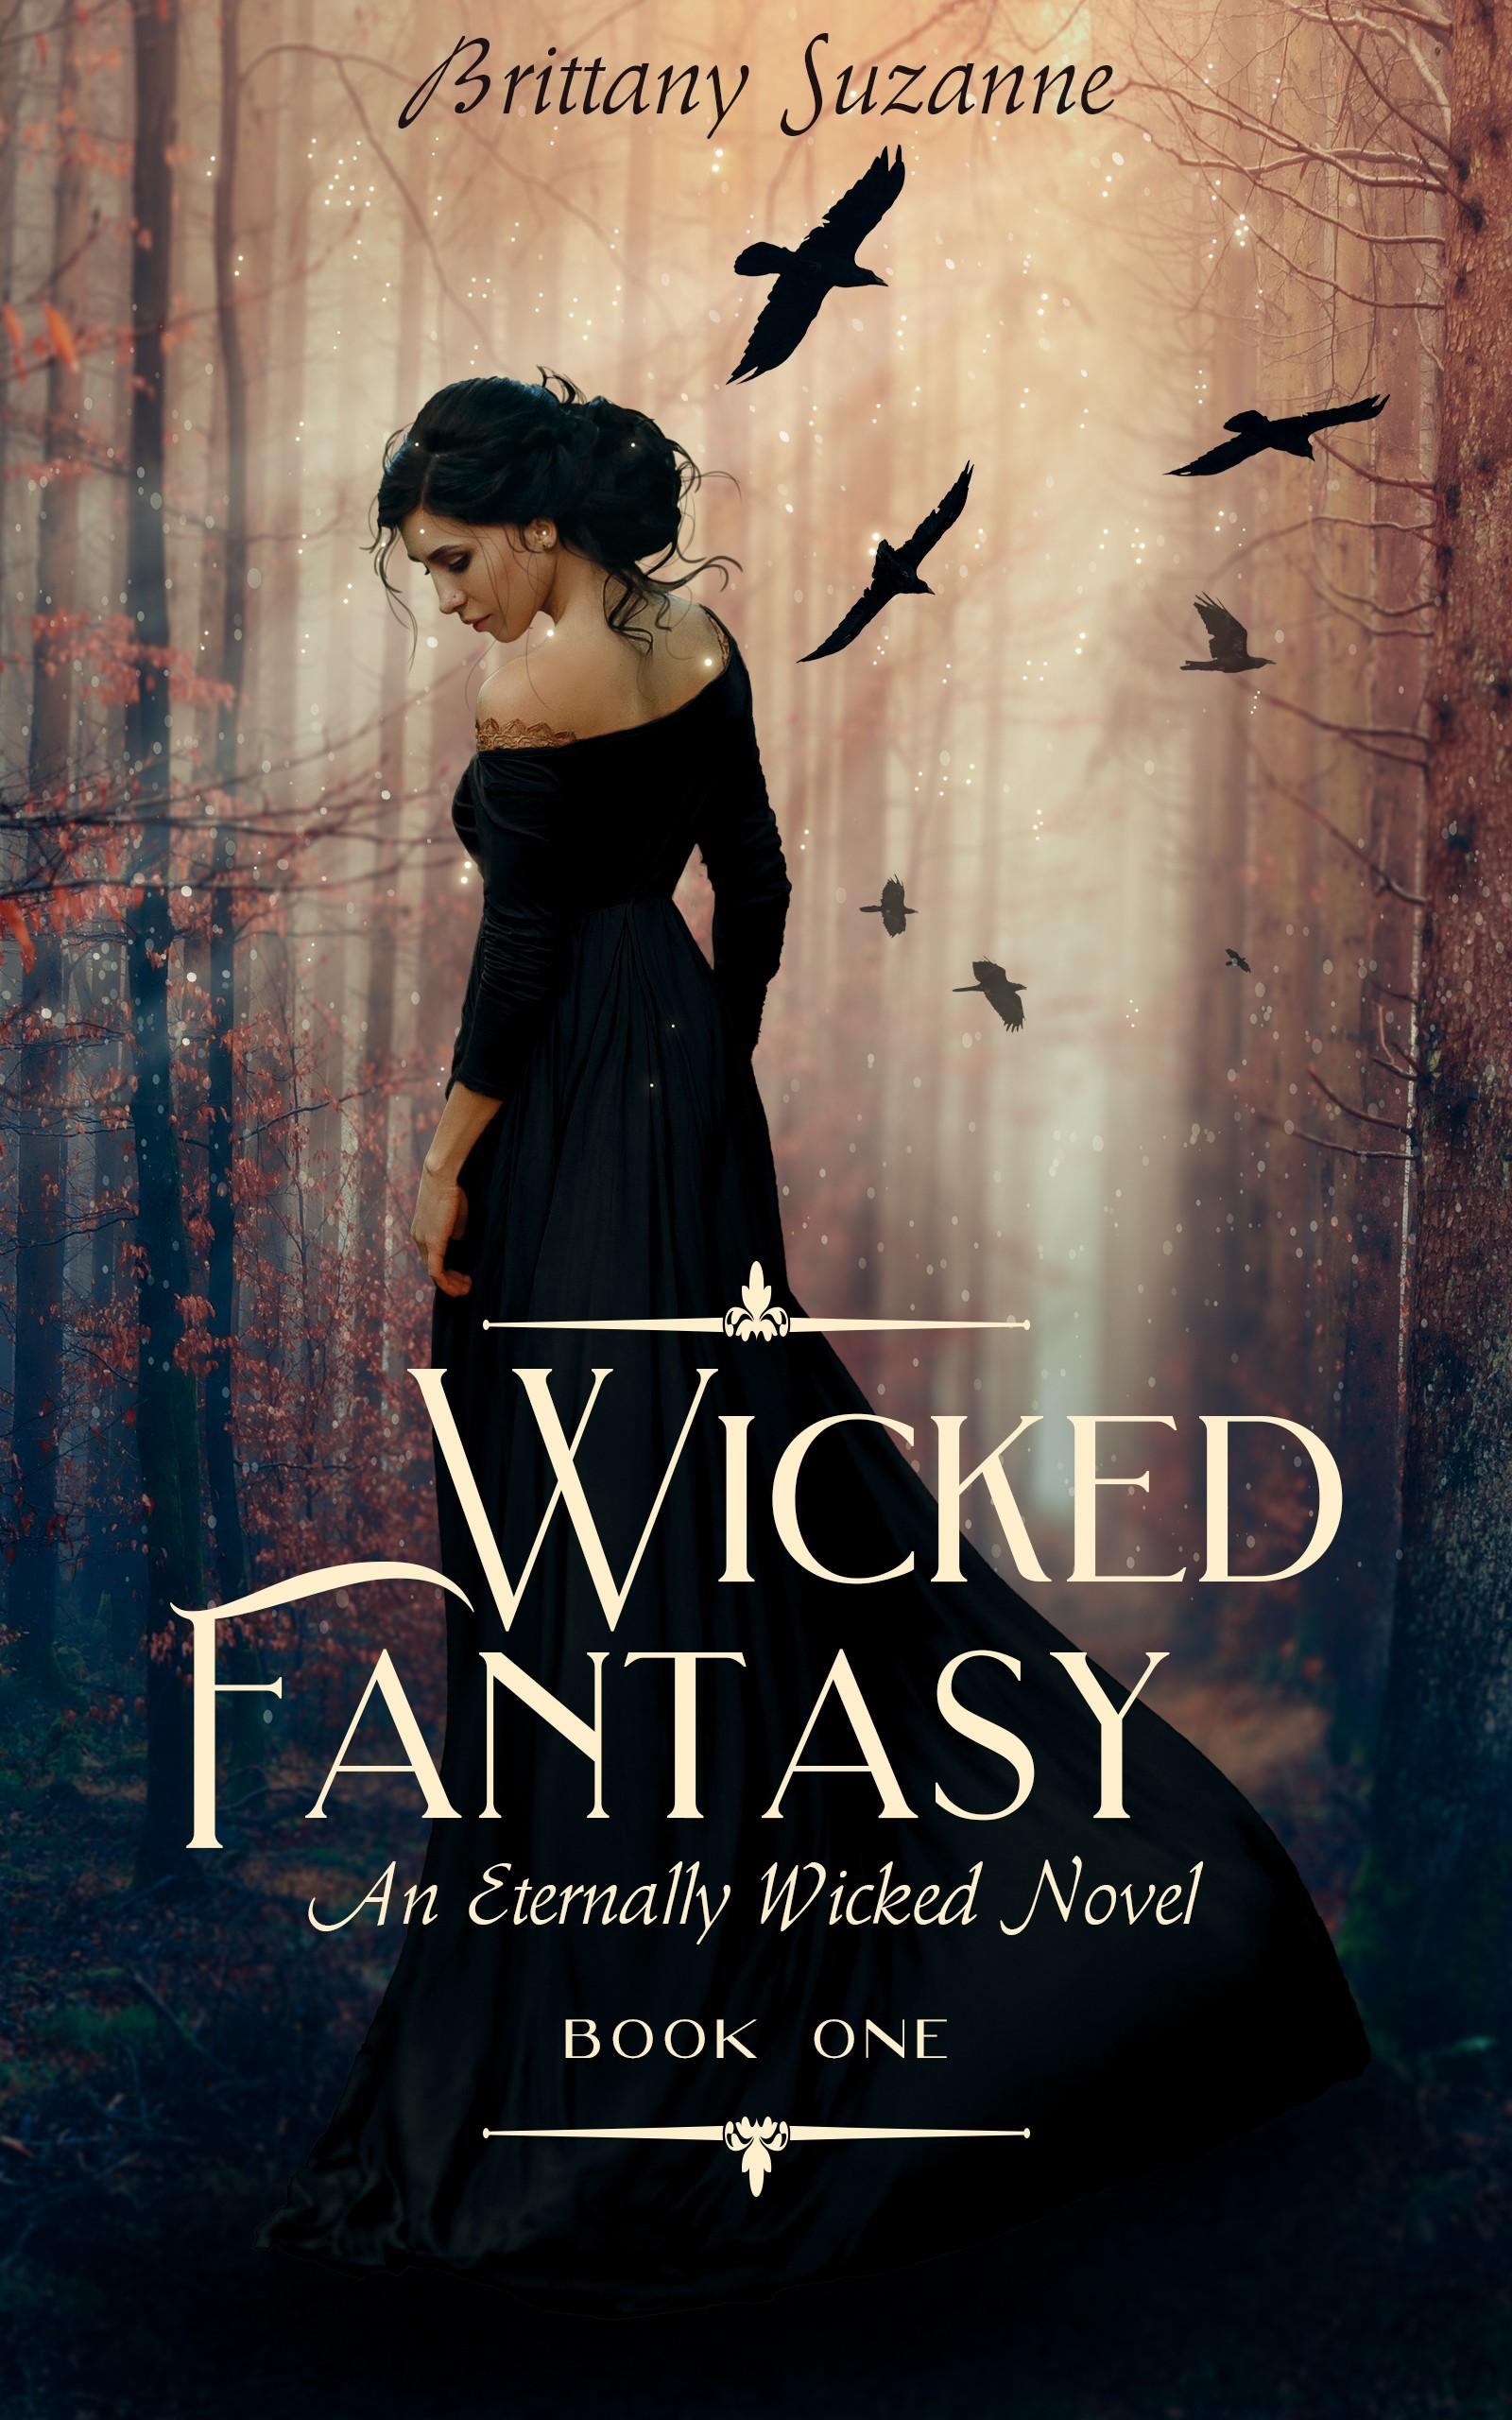 Eternally Wicked Book 1